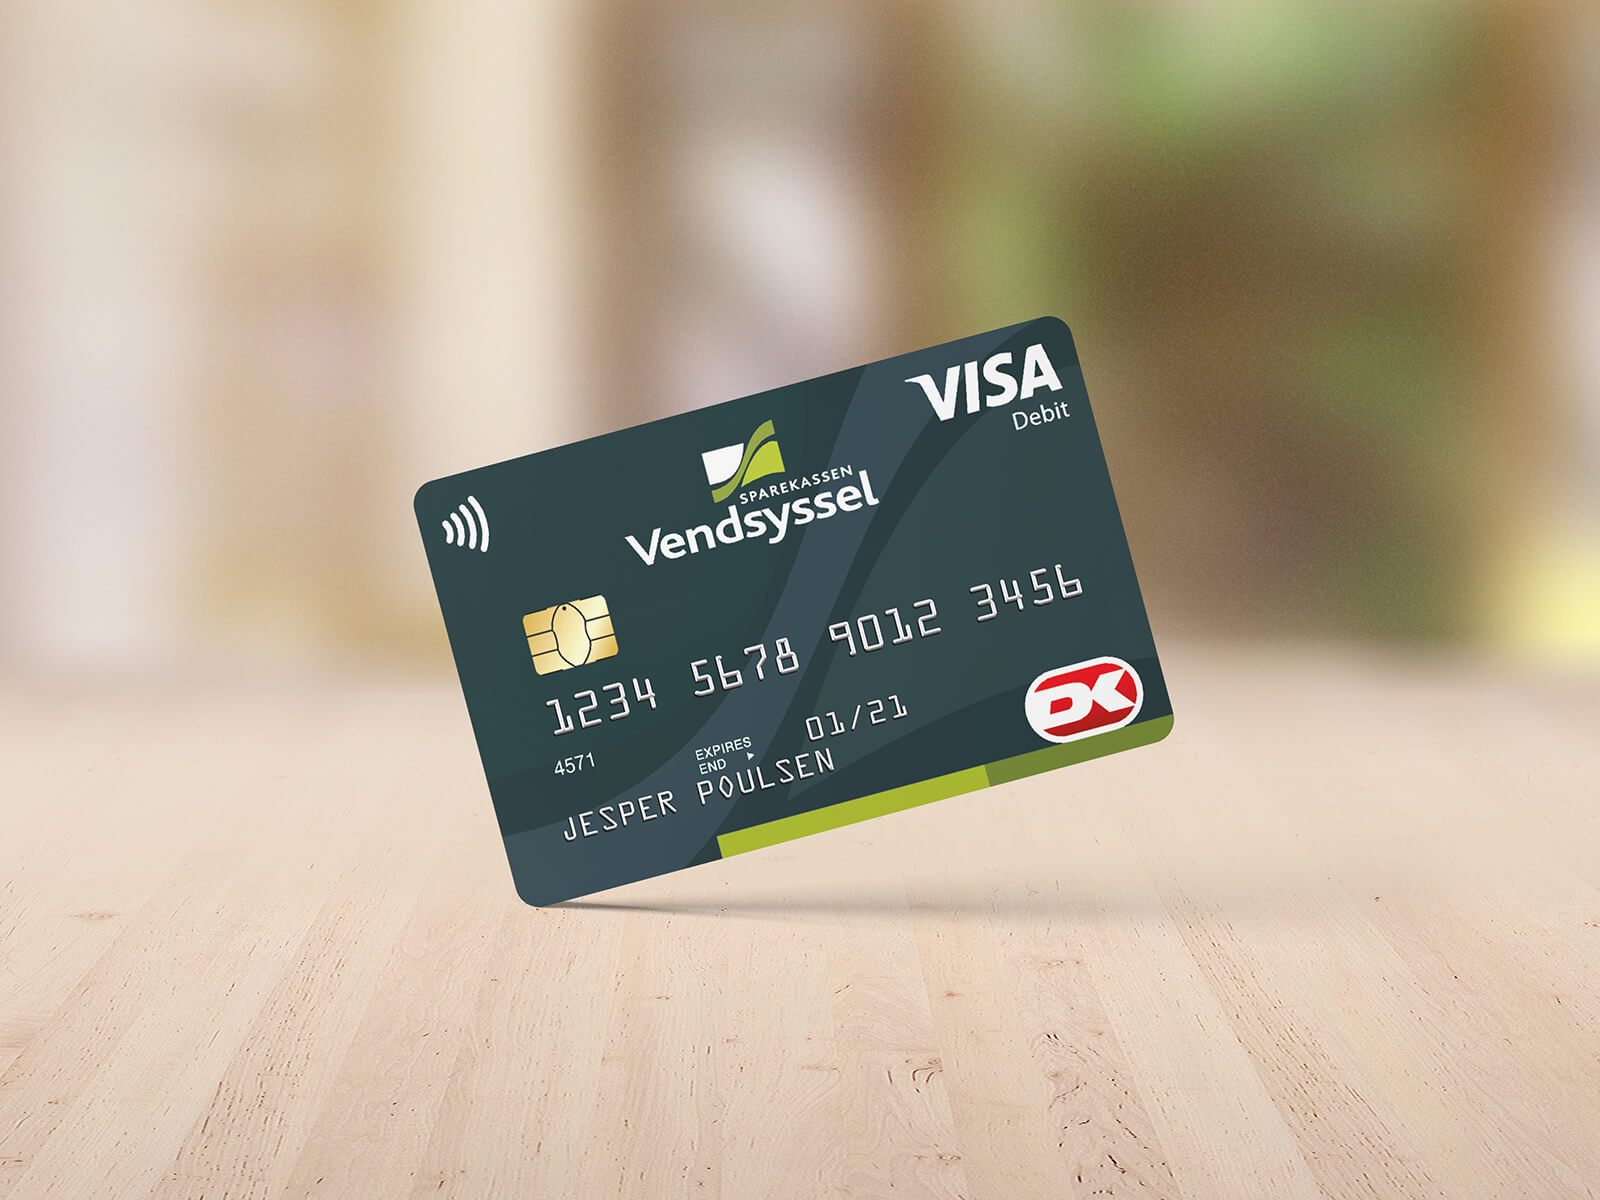 Visa Dankort Sparekassen Vendsyssel